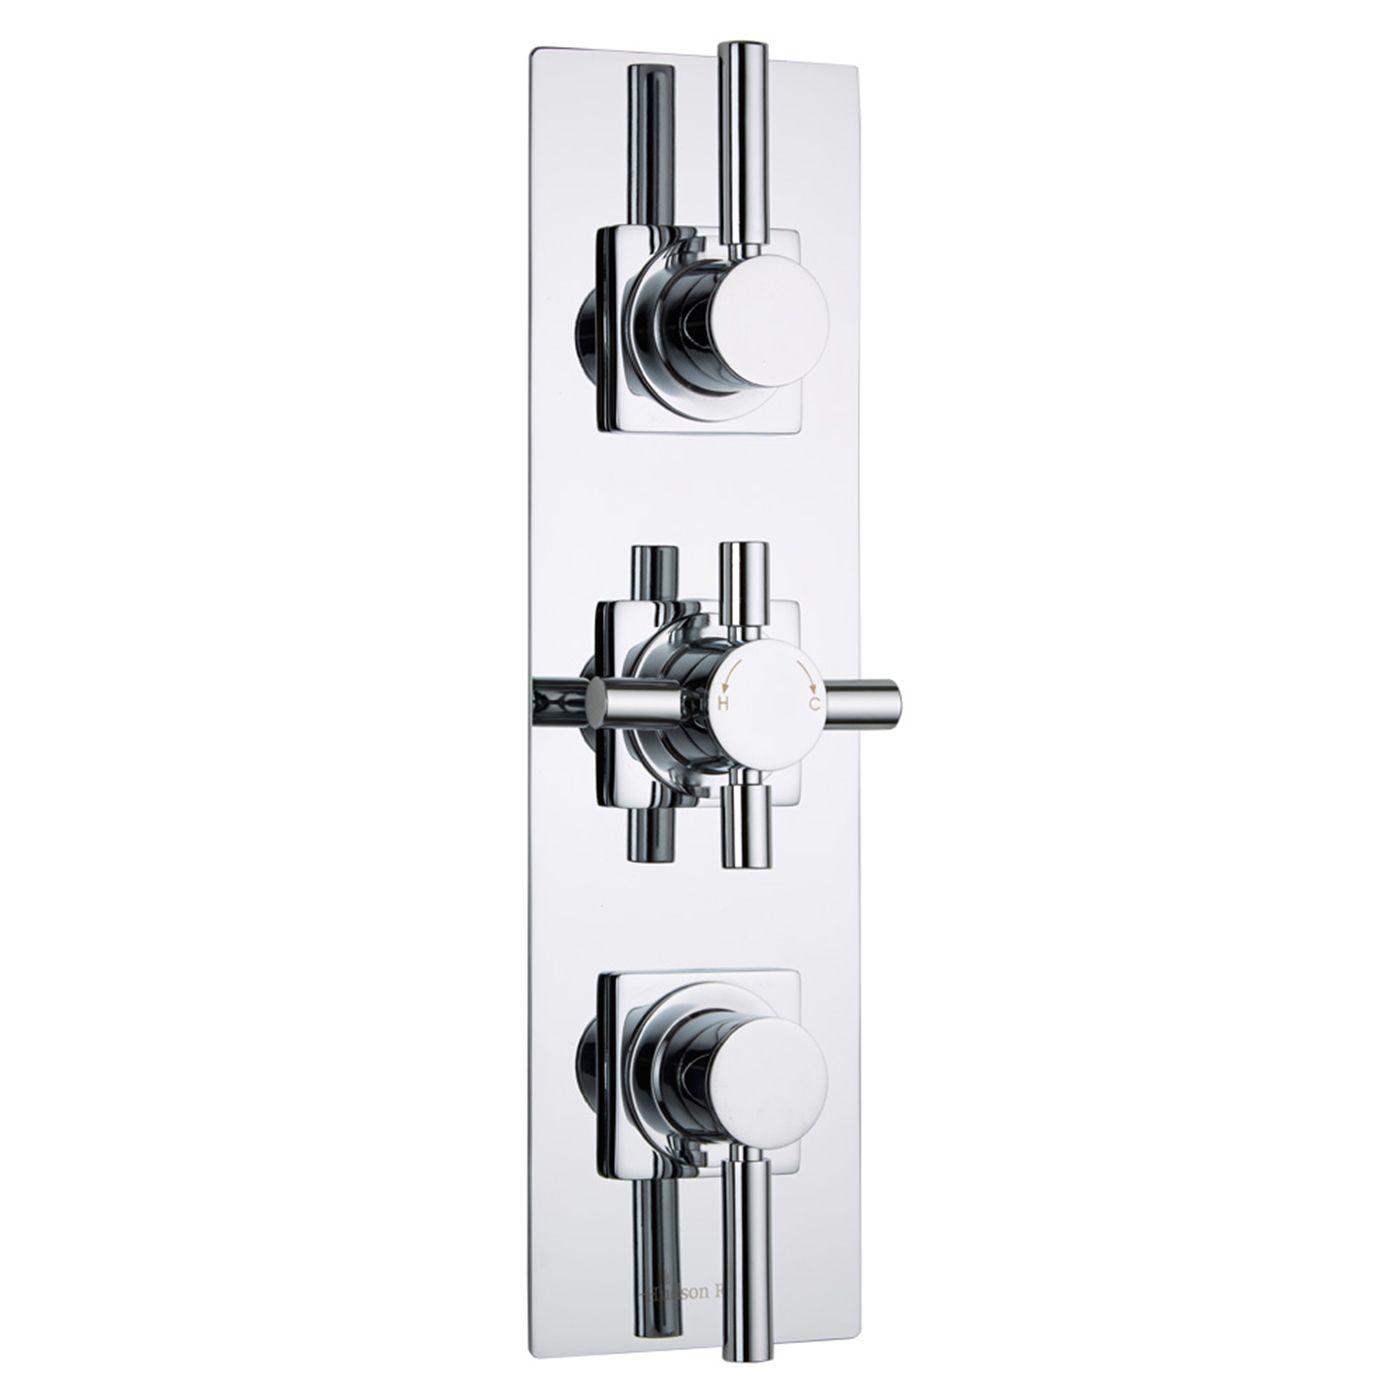 Tec Concealed 2 Outlet Triple Thermostatic Shower Valve (Slim Trim Plate)